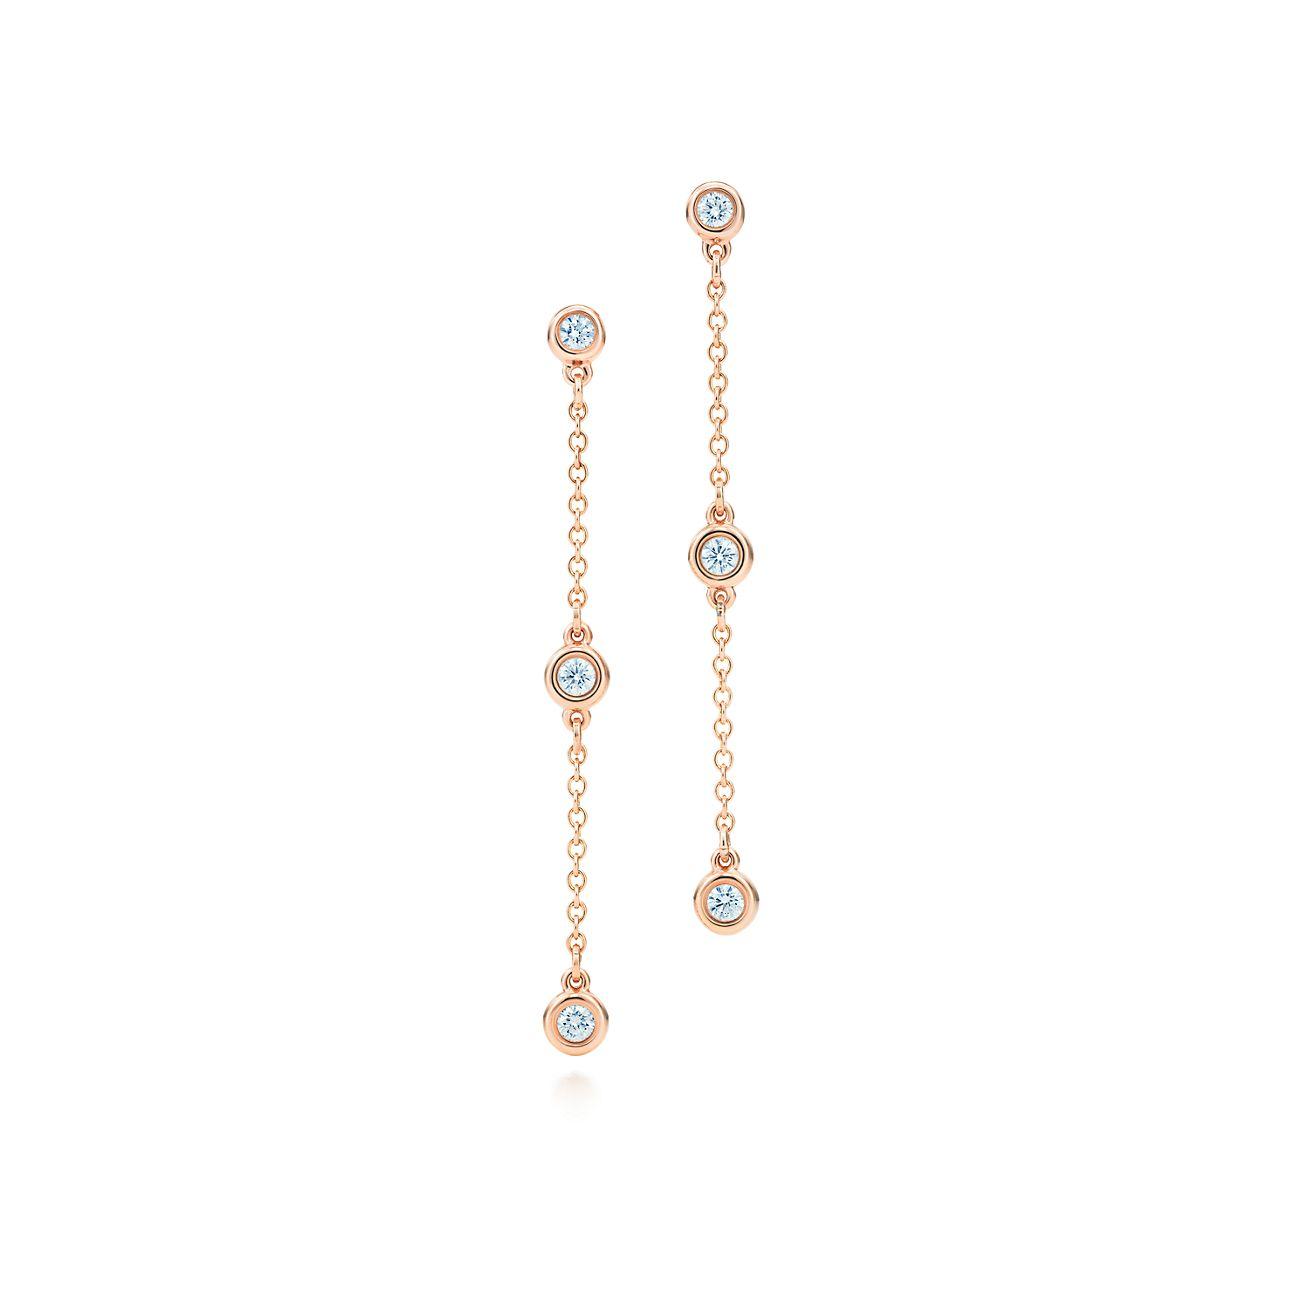 Elsa Peretti Pearls by the Yard chain earrings in 18k rose gold Tiffany & Co. VwAHf